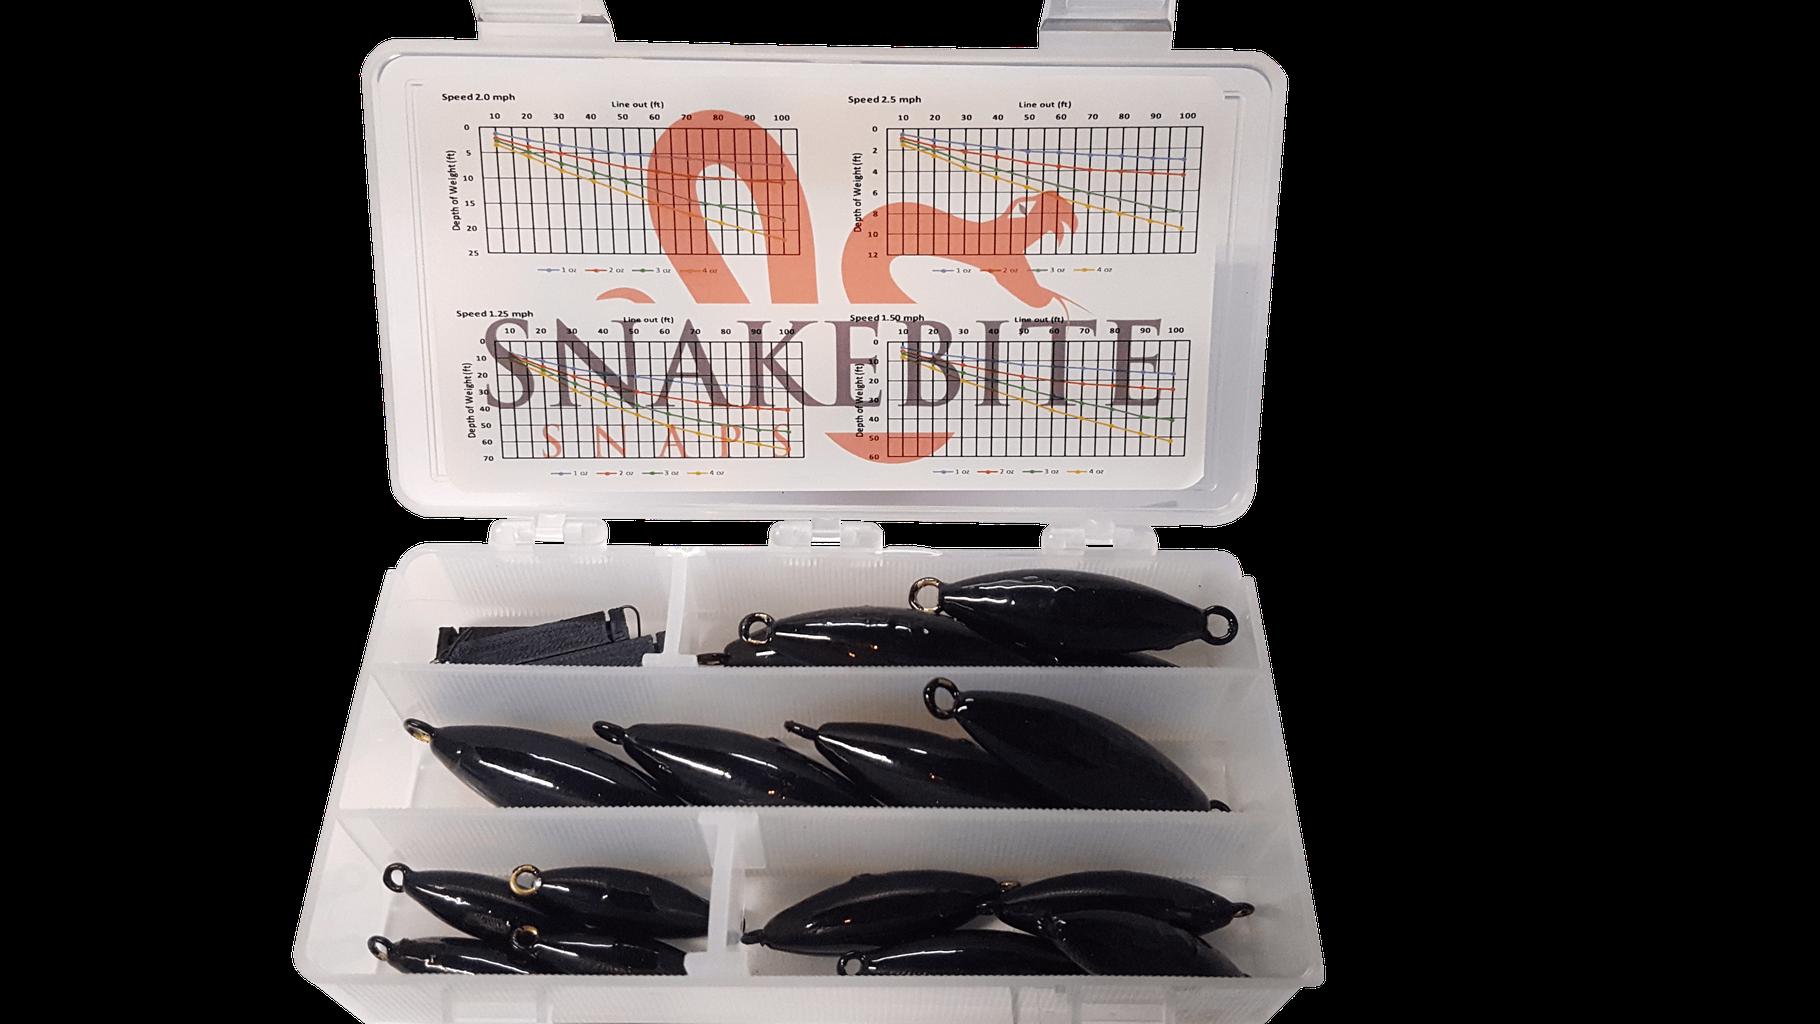 Fishing Snap Weights - snakebitesnaps